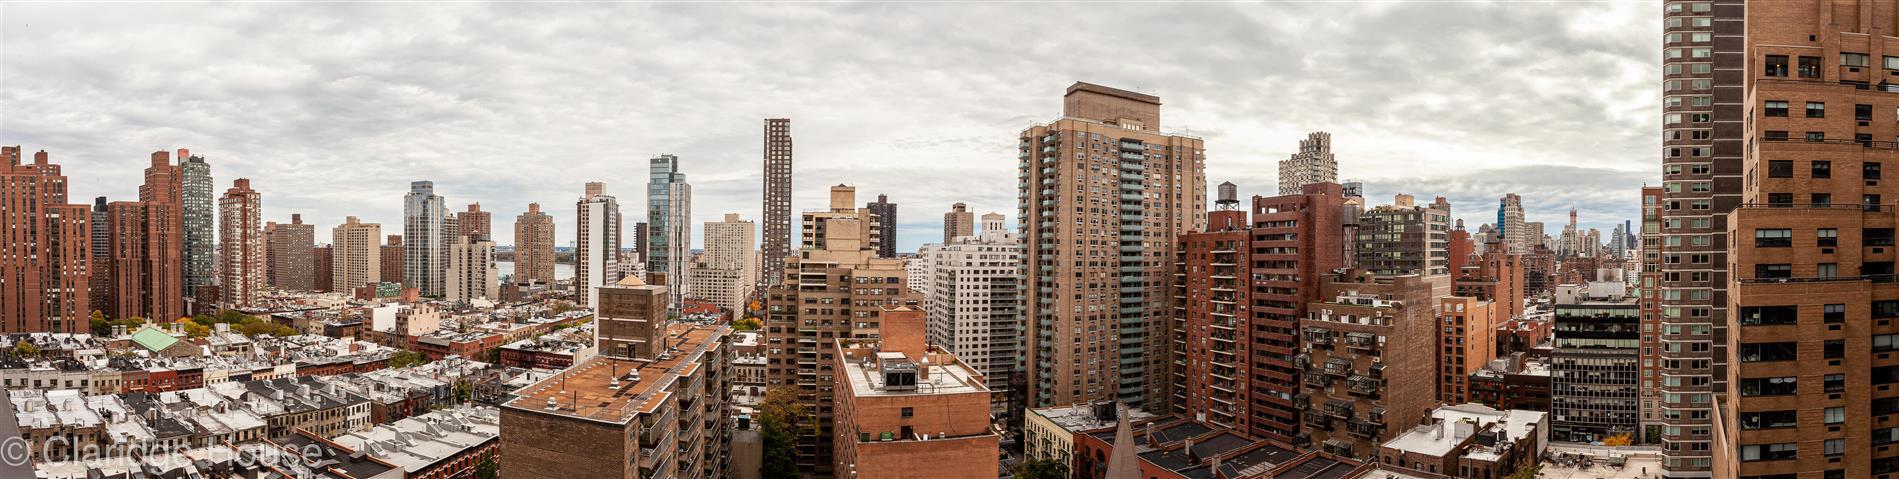 WD Upper East Side NO FEE